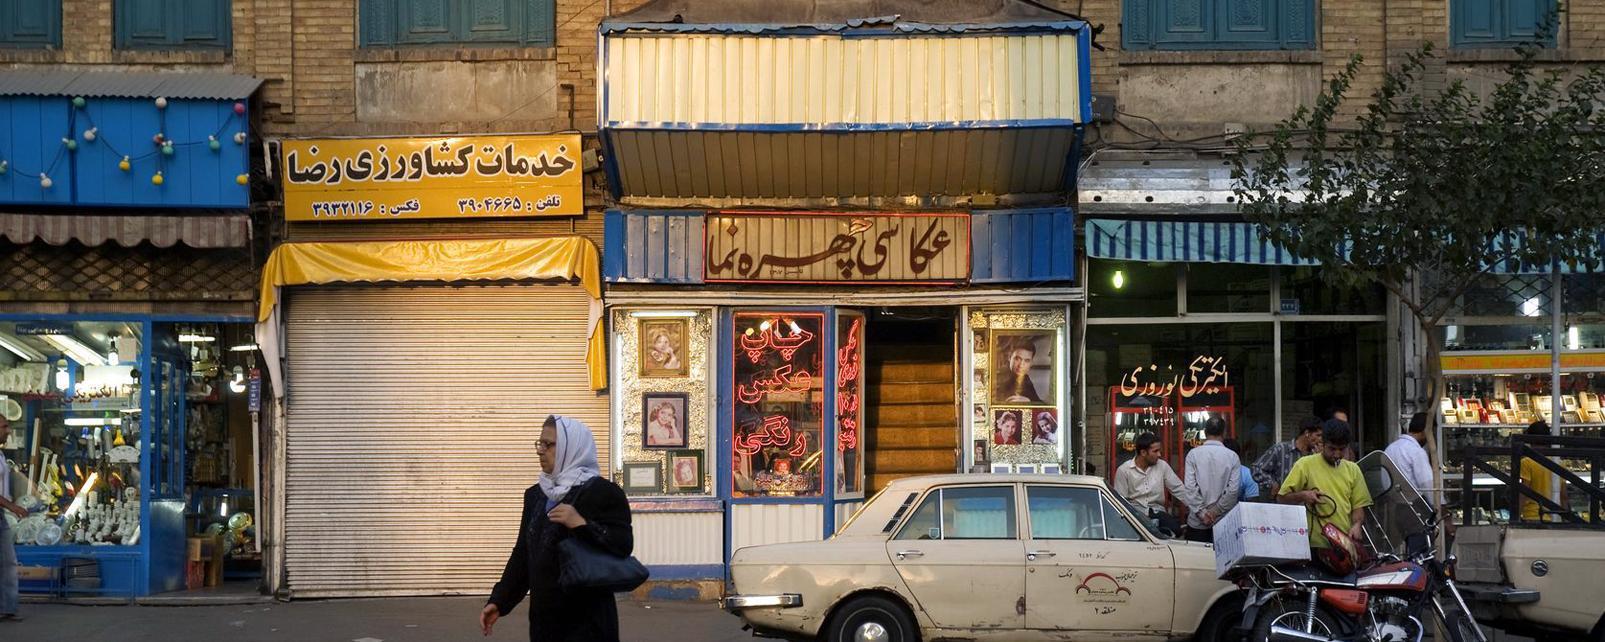 Moyen-Orient; Iran; Teheran;